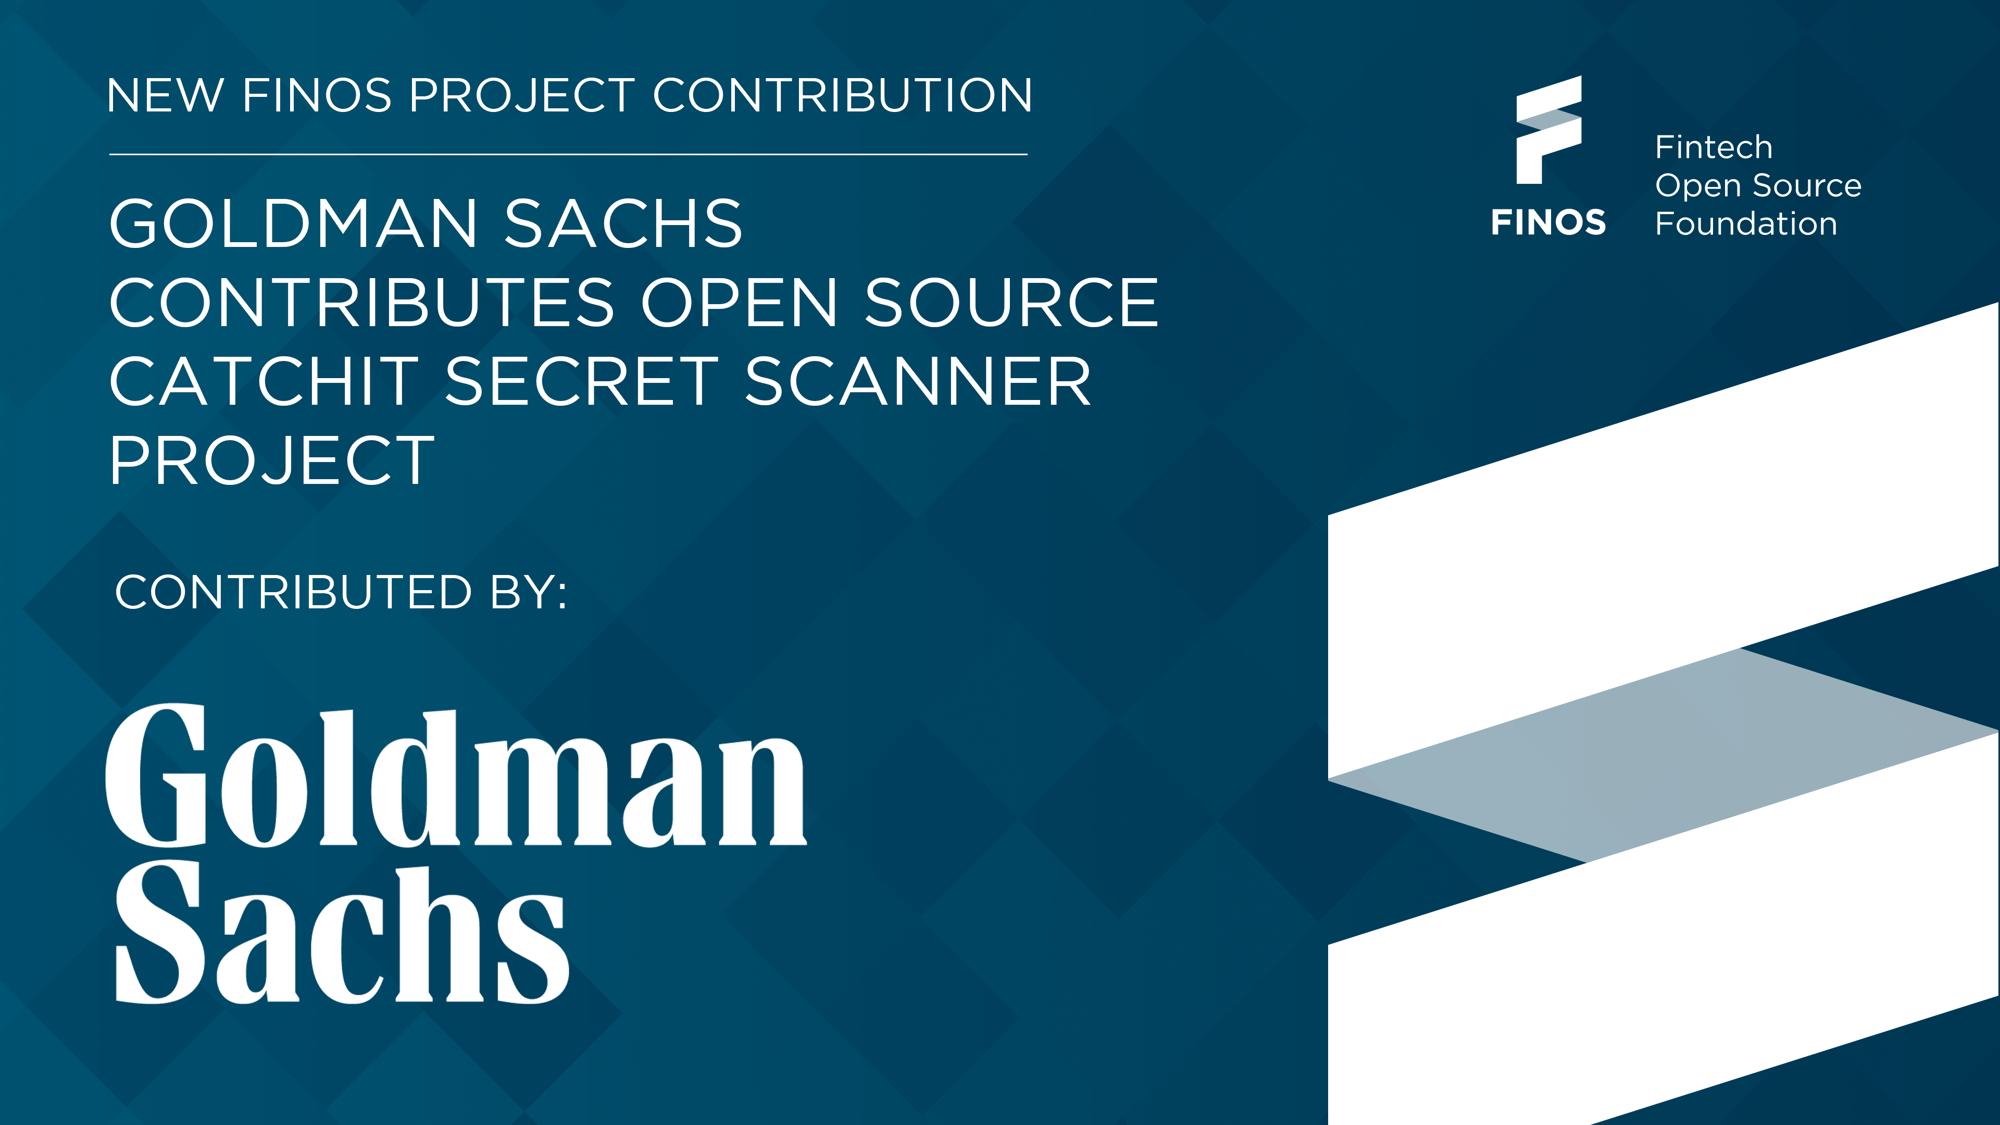 FINOS-catchit-secret-scanner-contribution-gs